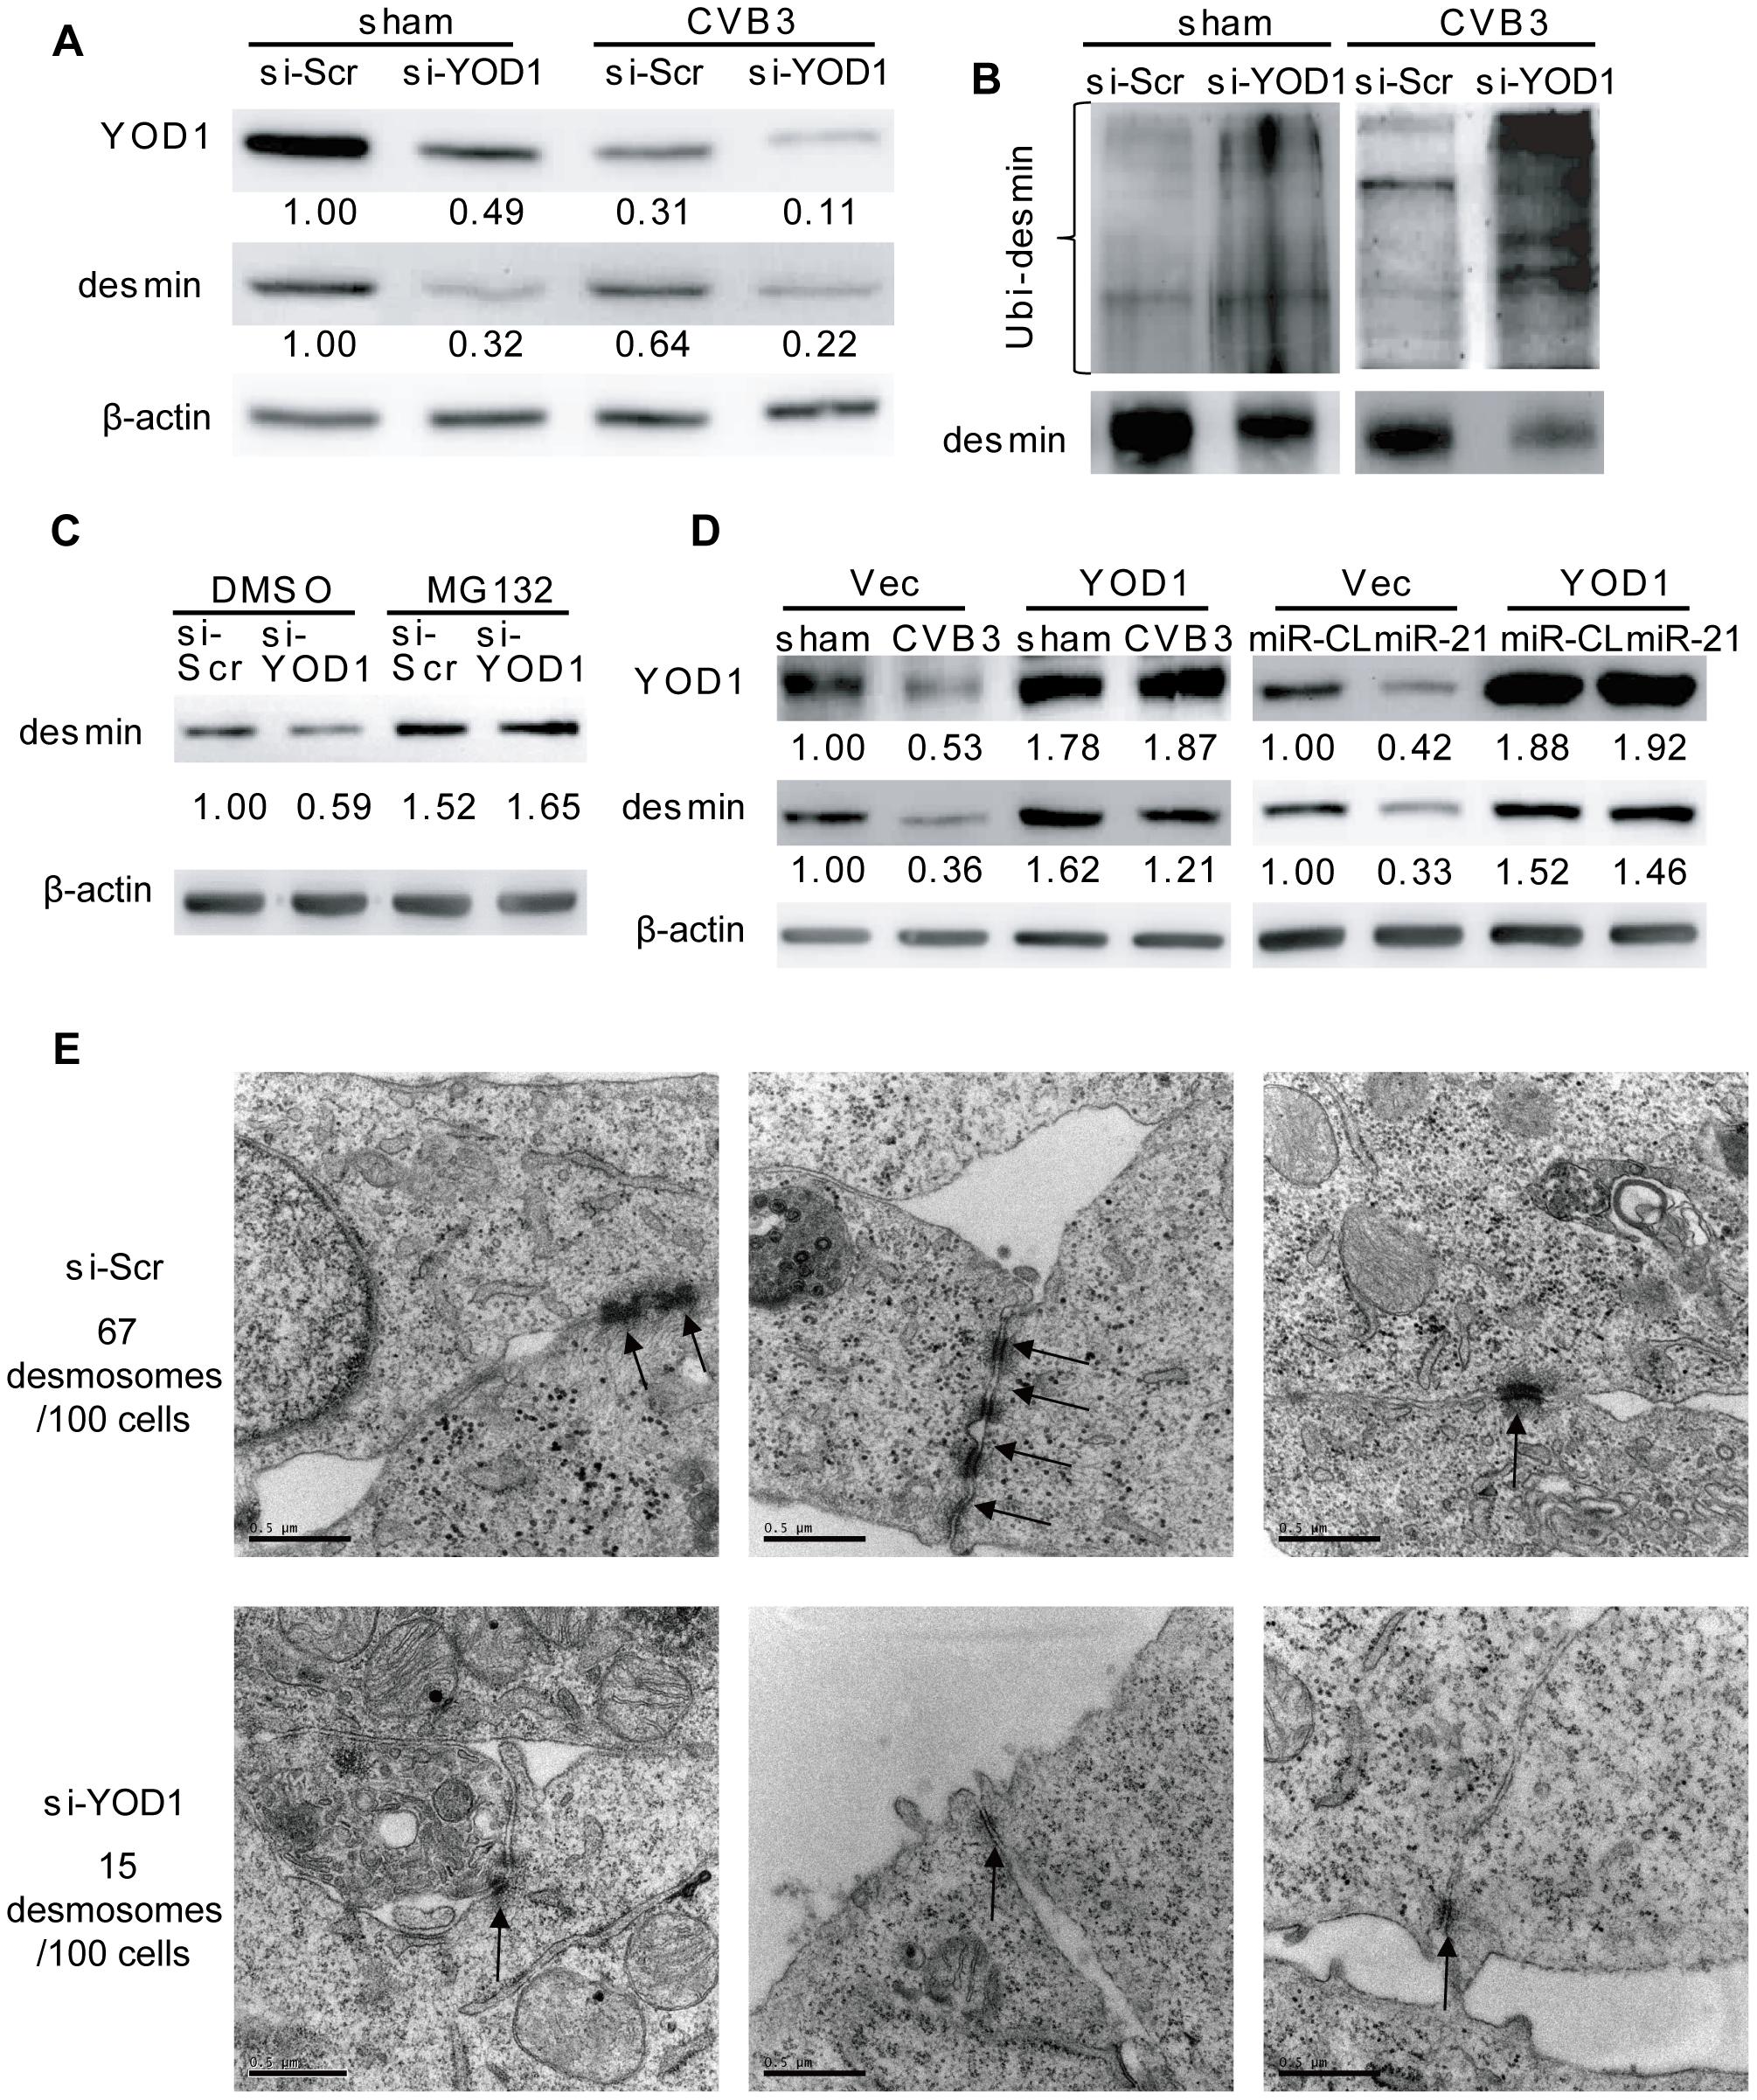 YOD1 regulates desmin degradation during CVB3 infection.